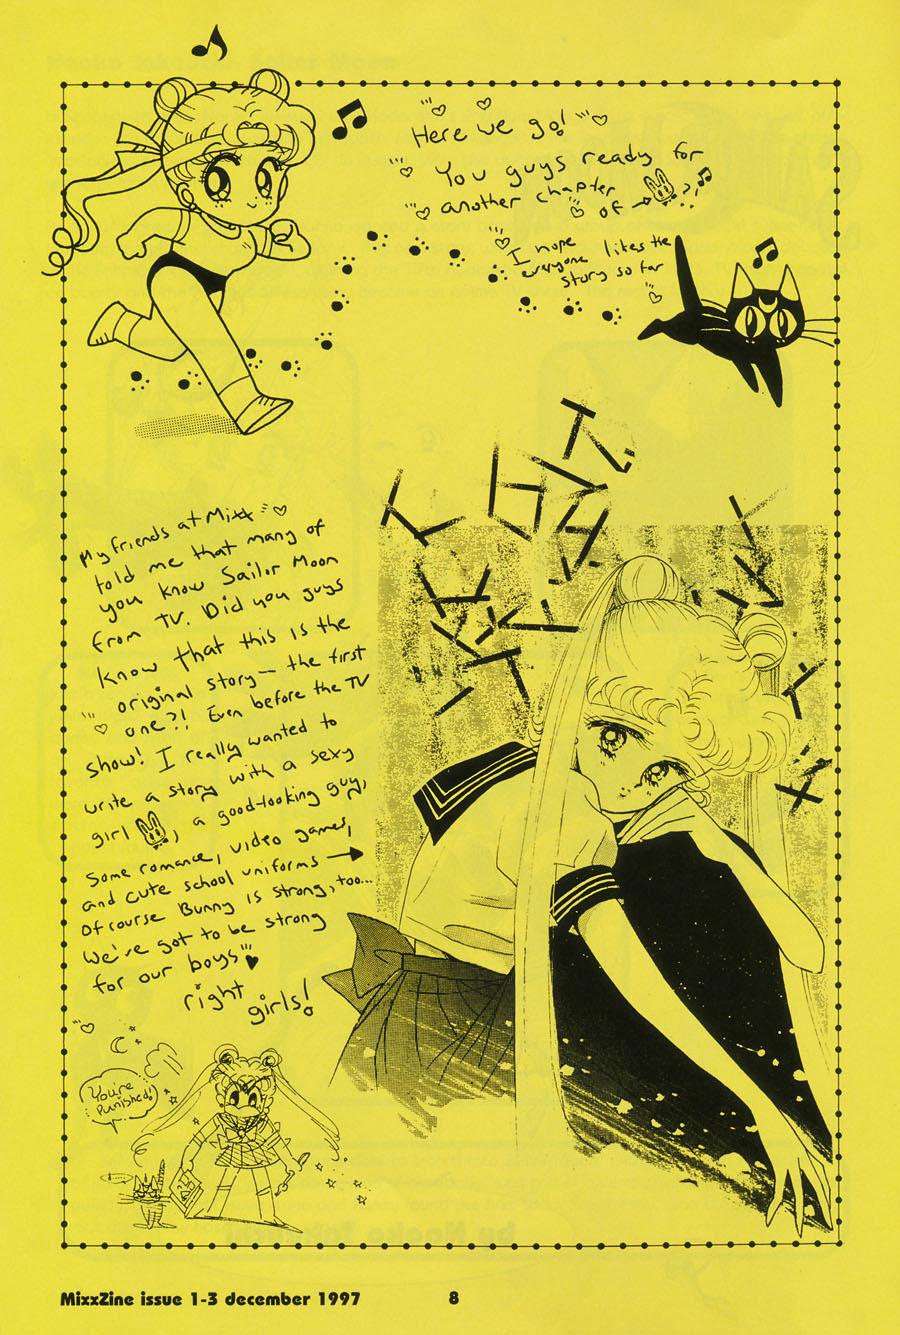 Sailor-Moon-Manga-art-Mixx-Zine-Issue-3-December-1997